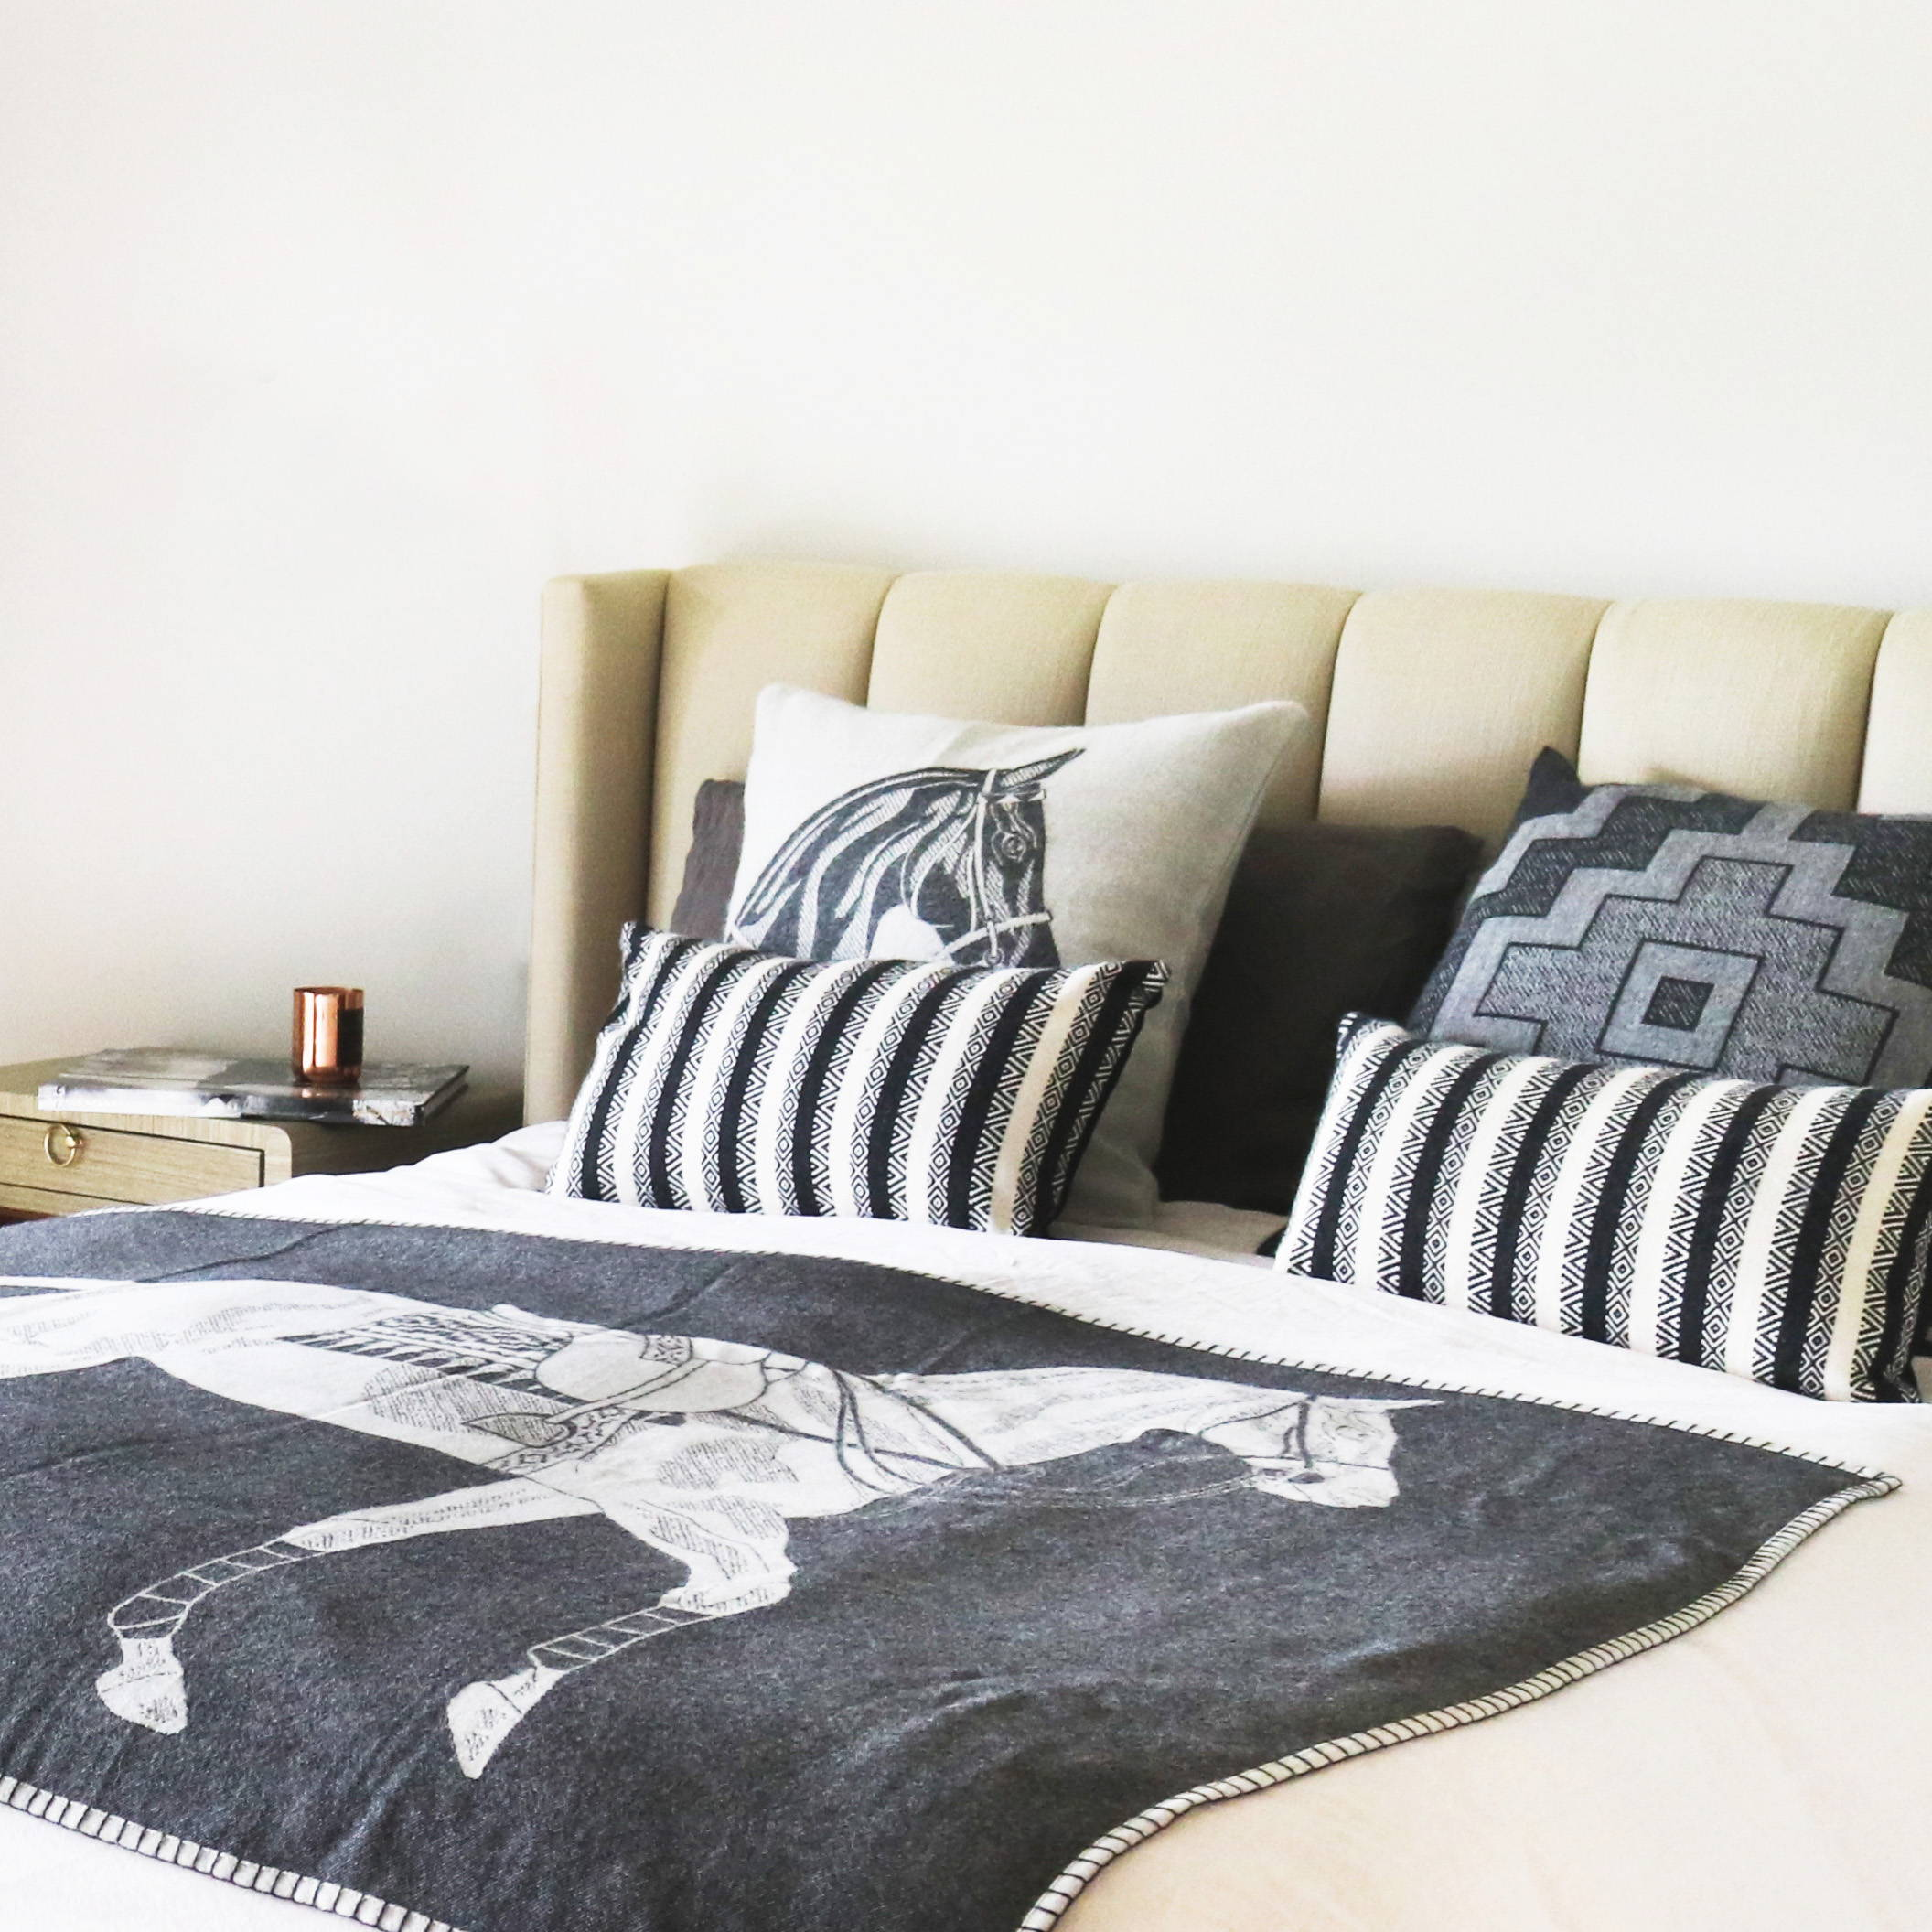 Bedroom display of Alpaca Decorative Pillows with the Alpaca Polo Pony Throw Blanket - Stick & Ball